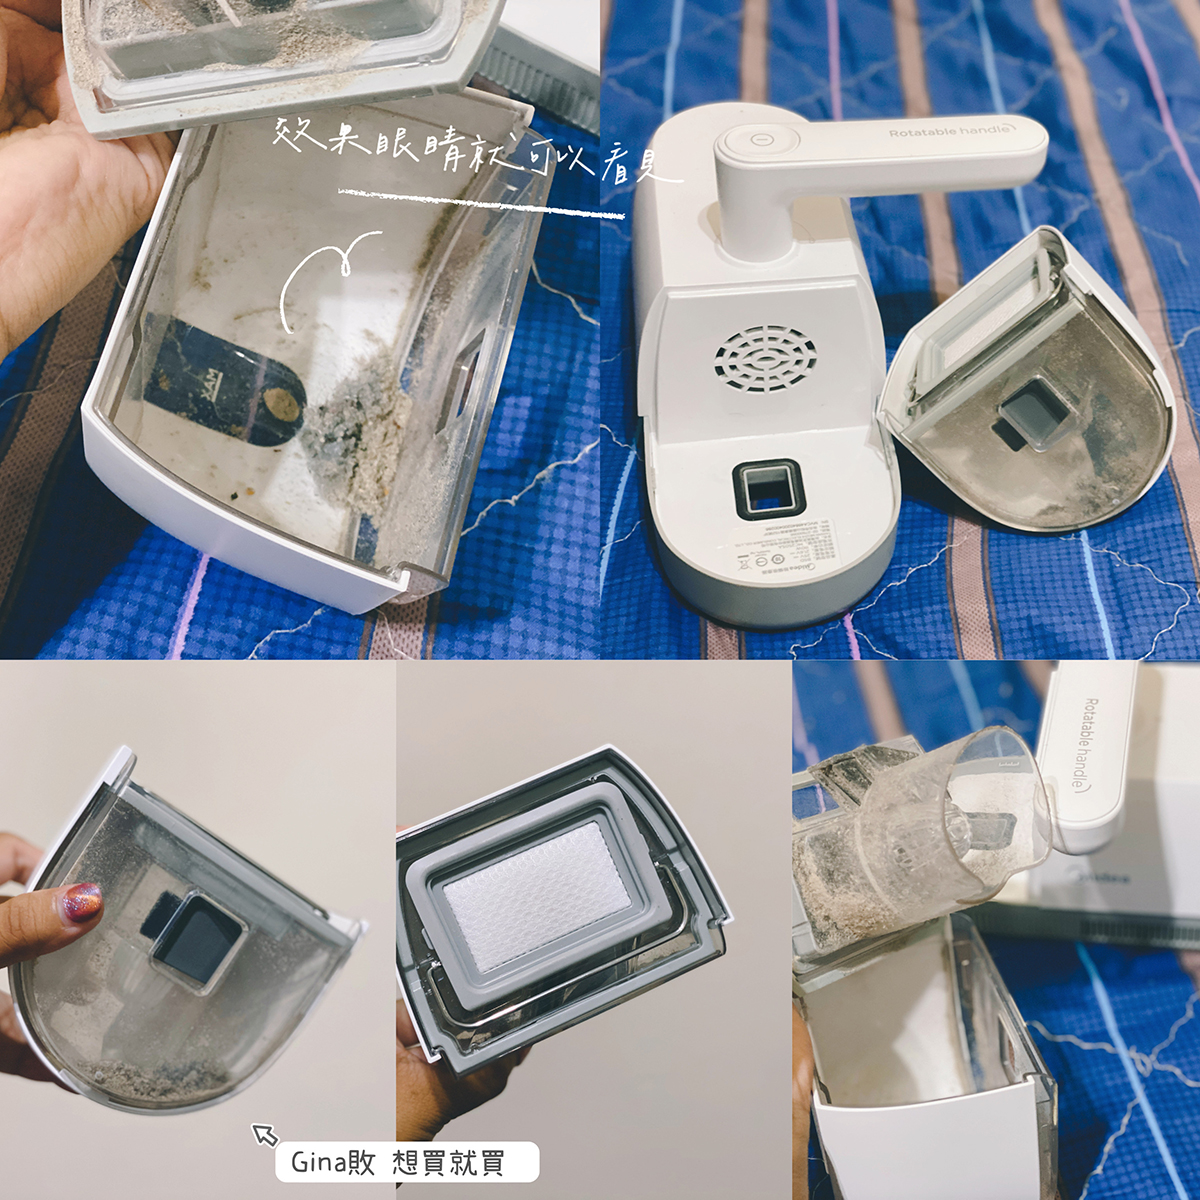 【MIDEA美的】無線UV紫外線除蟎機|時尚可愛可水洗|限時留言送吸塵器 @GINA環球旅行生活|不會韓文也可以去韓國